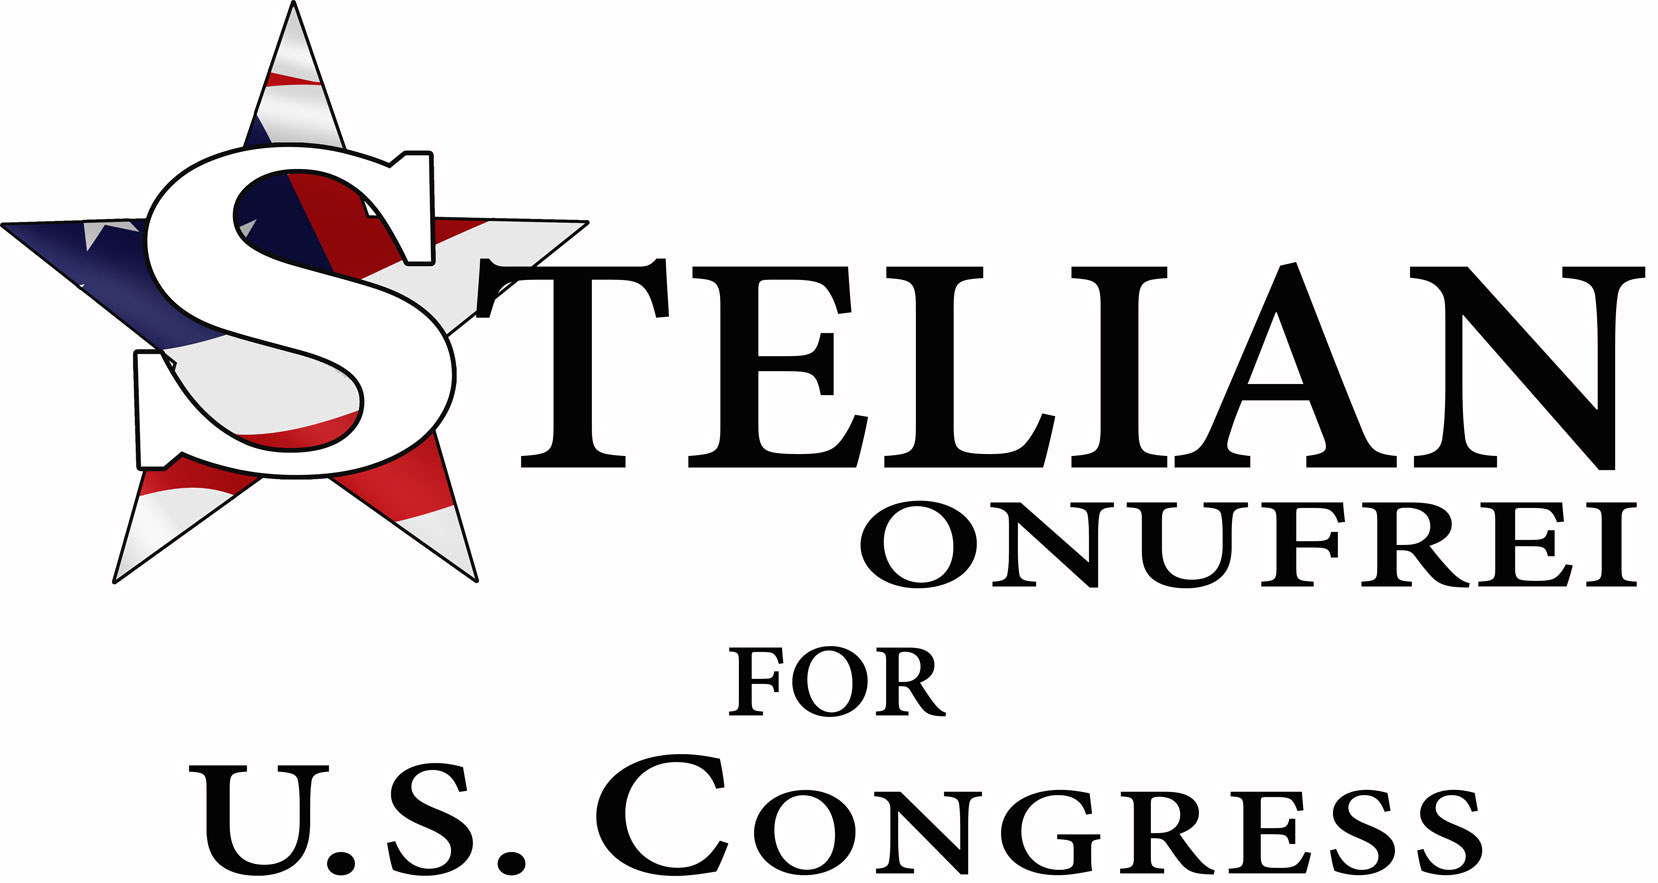 Stelian Onufrei for Congress